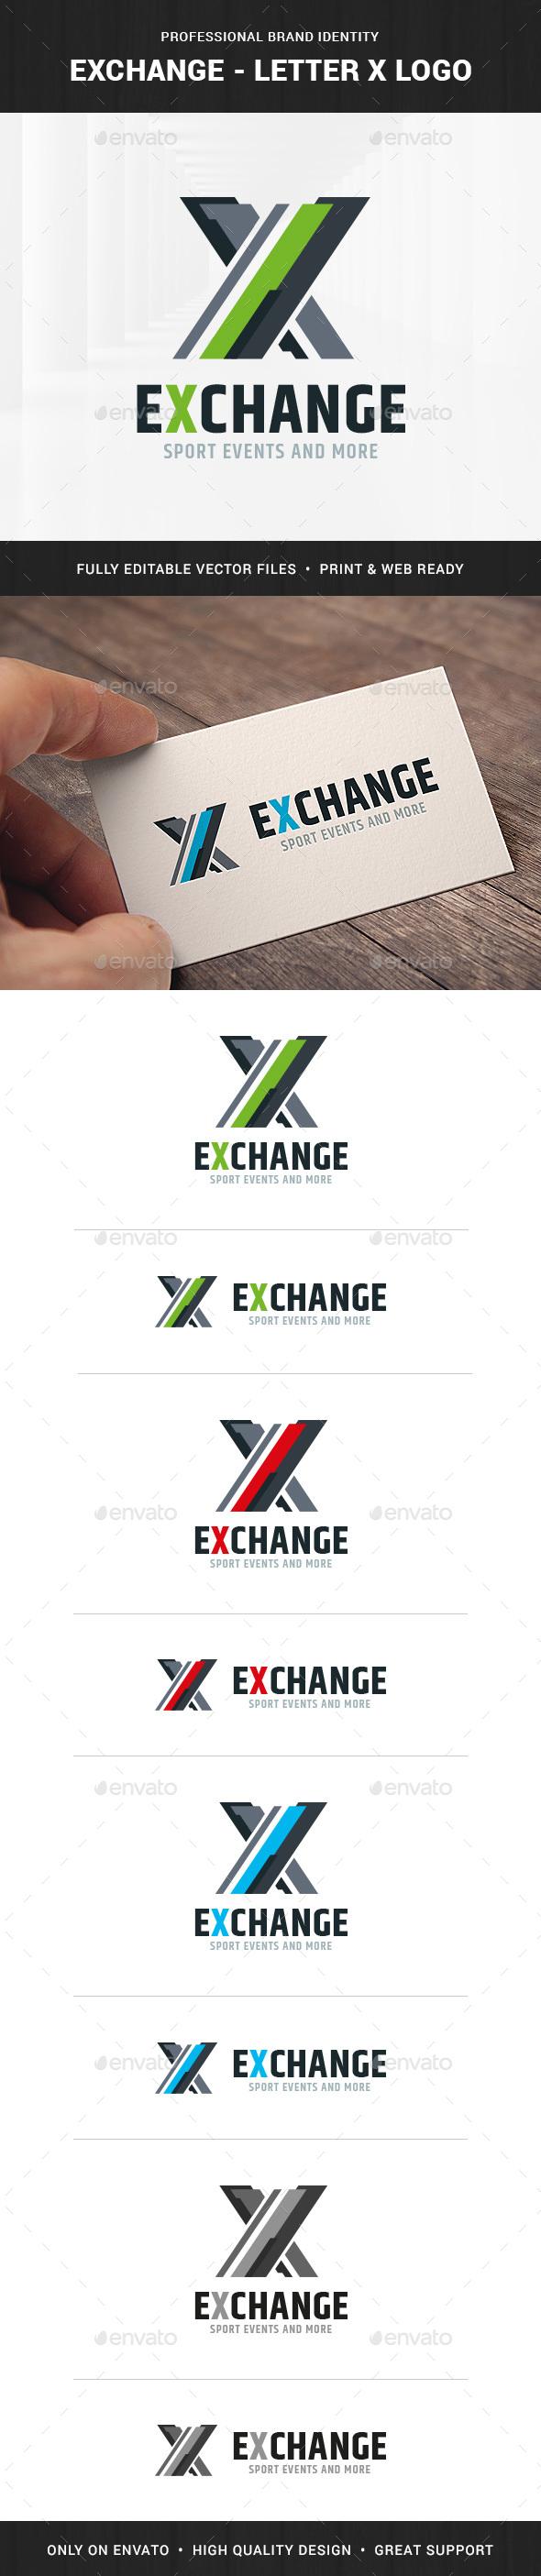 Exchange - Letter X Logo